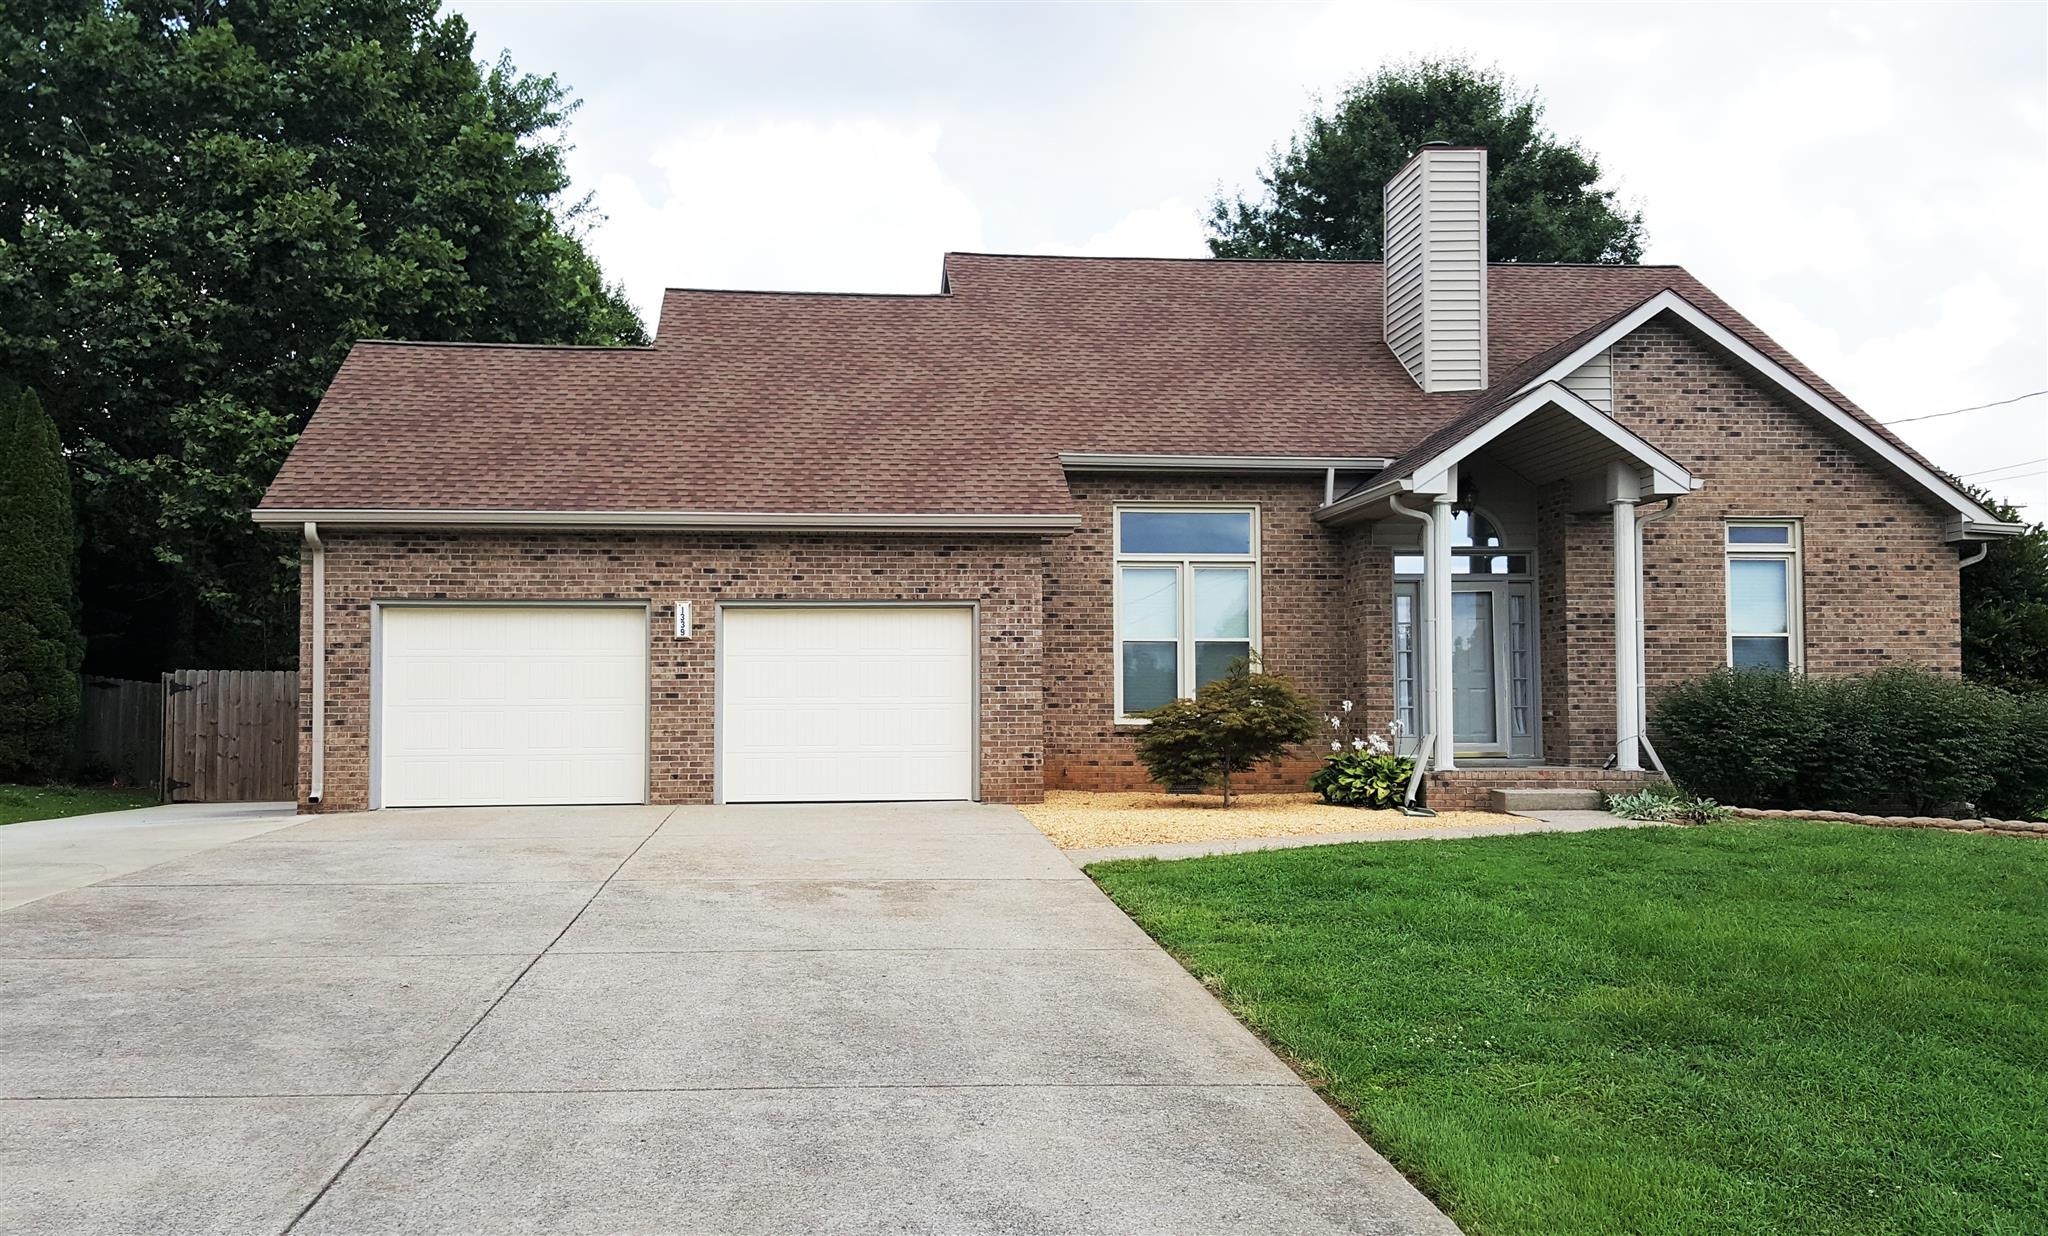 1339 N Shadowlawn Ct, Clarksville, TN 37040